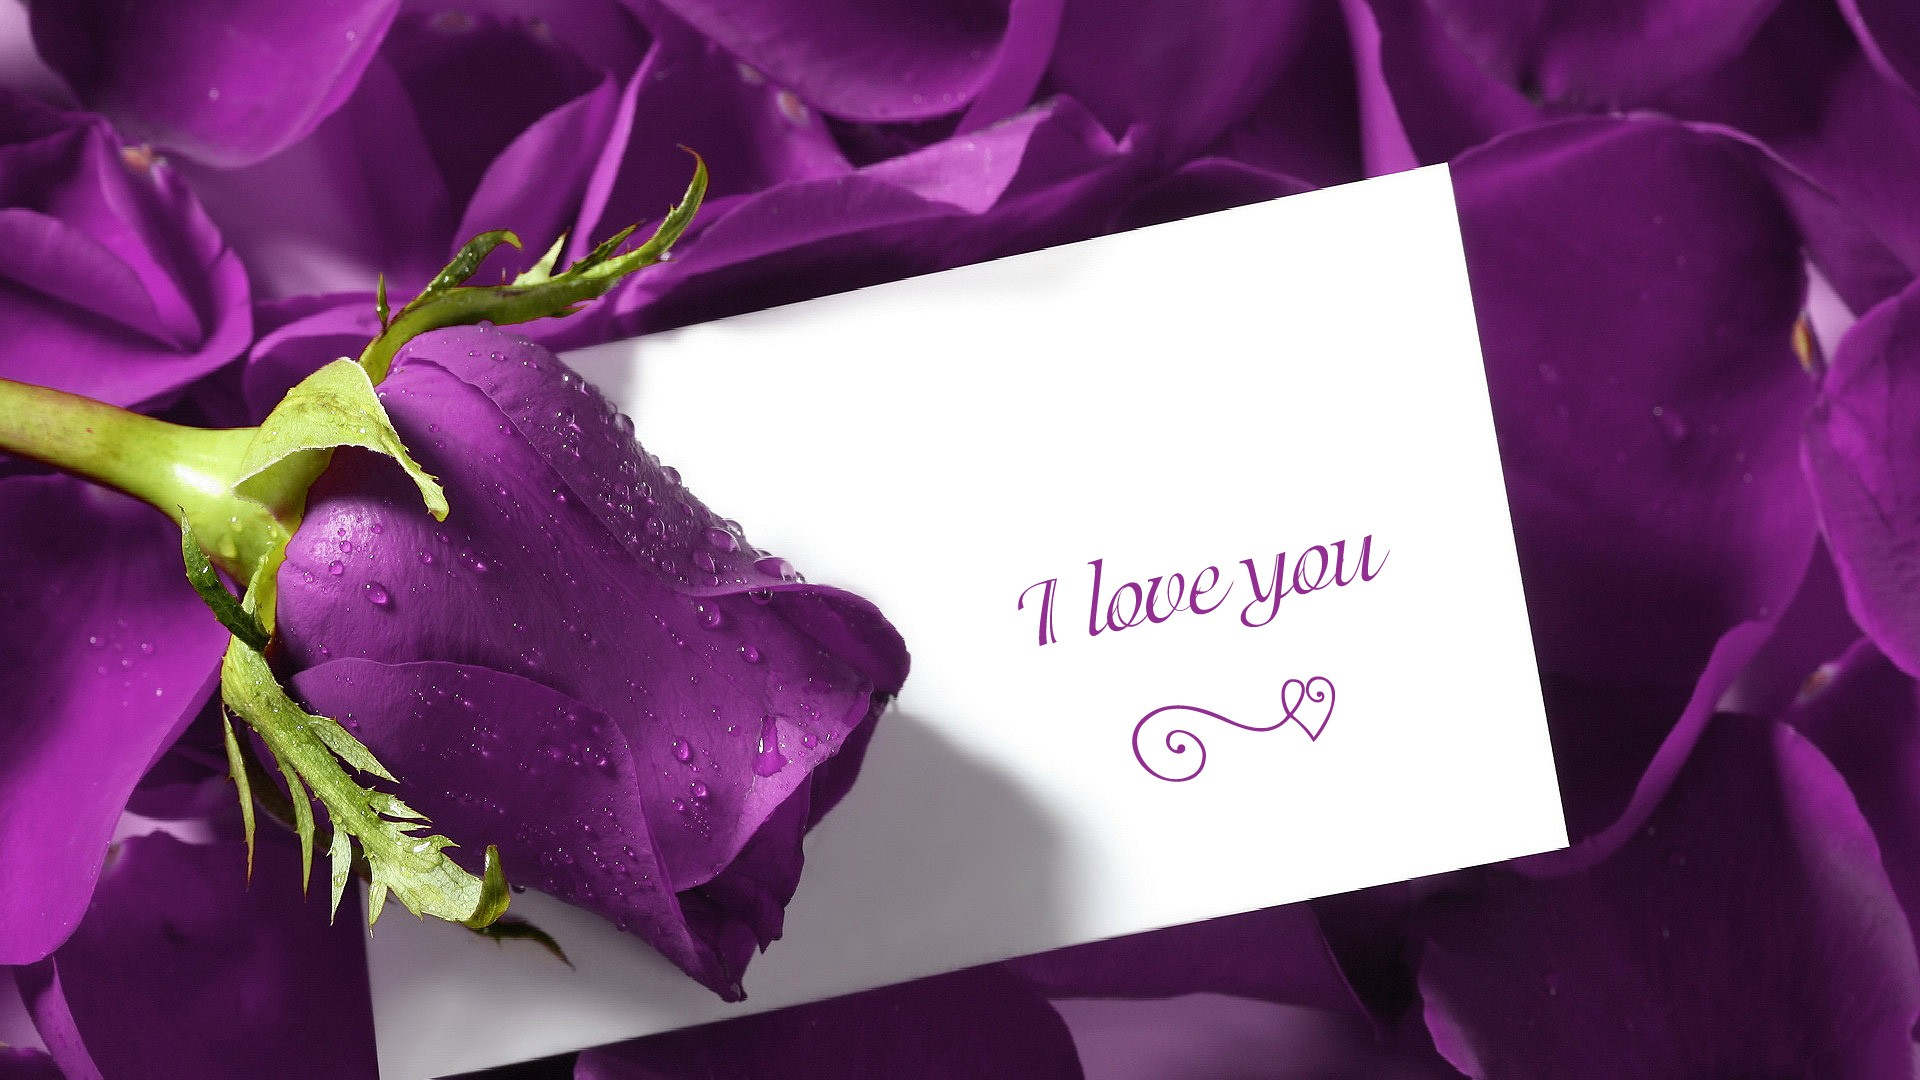 Love You Valentine Cards HD Wallpaper of Love   hdwallpaper2013com 1920x1080